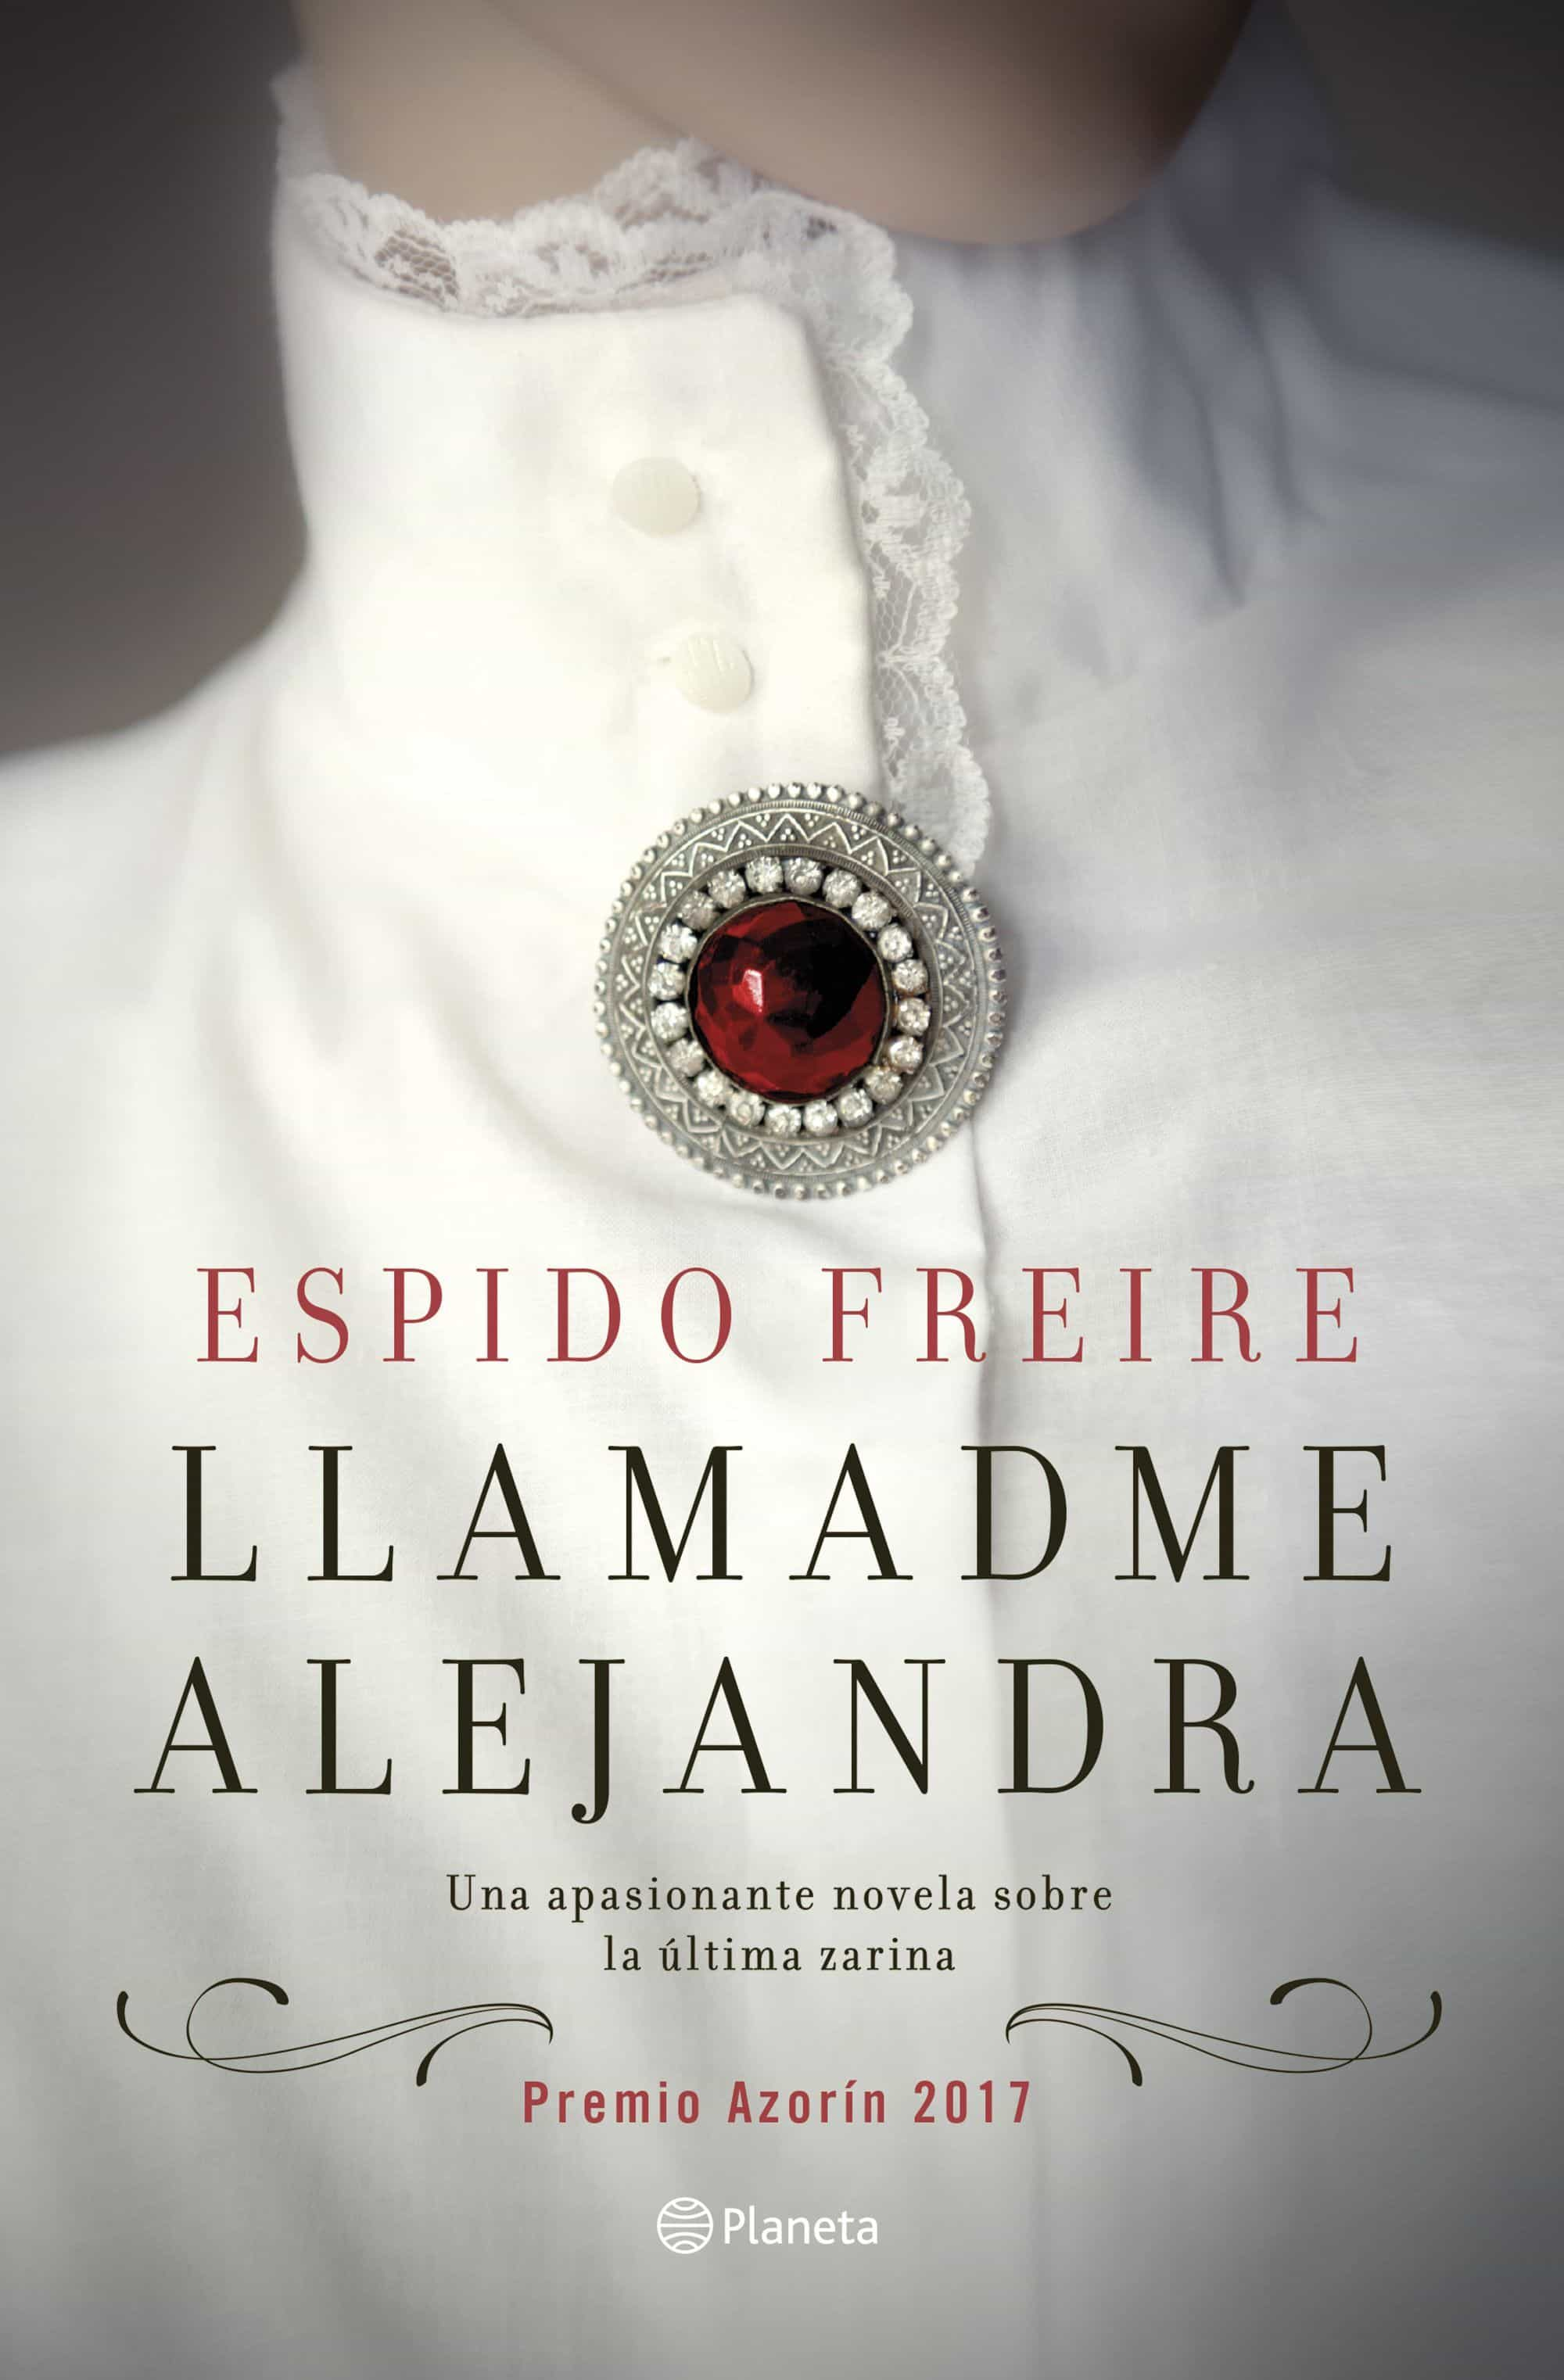 Llamadme Alejandra (premio Azorín De Novela 2017) por Espido Freire